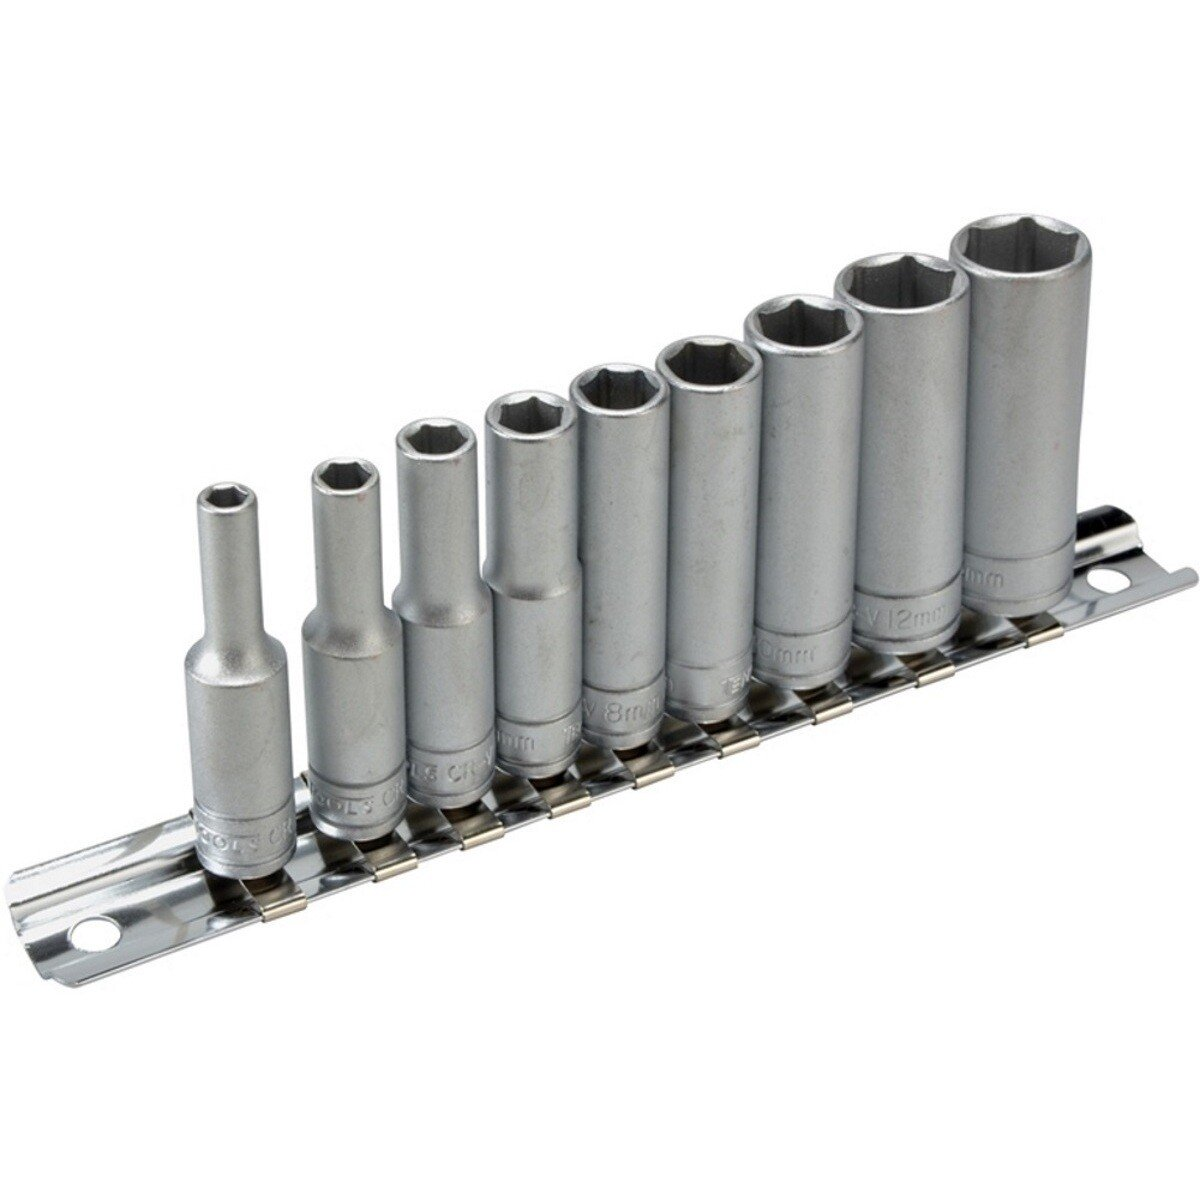 "Teng Tools M1407 Deep Socket Metric Clip Rail Set 10 Piece 1/4"" Drive TENM1407"